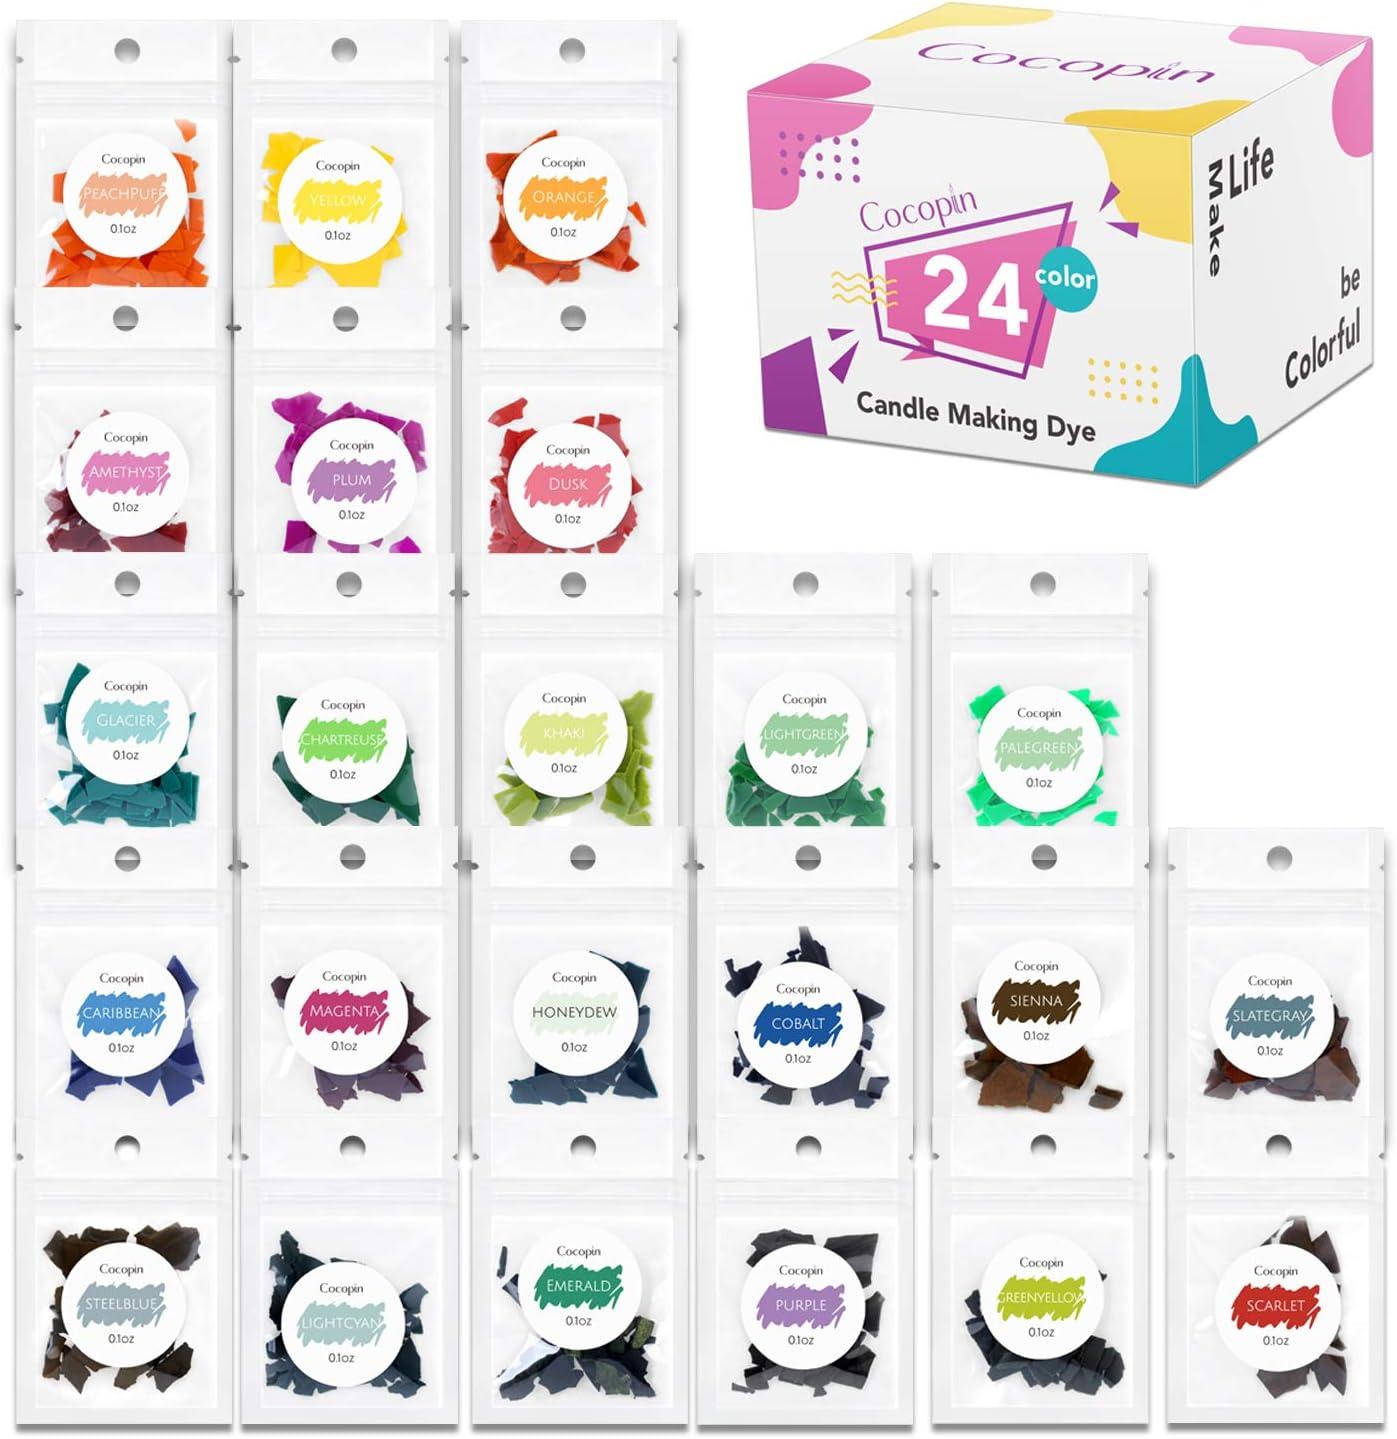 Pack de 24 virutas de cera, tinte para velas